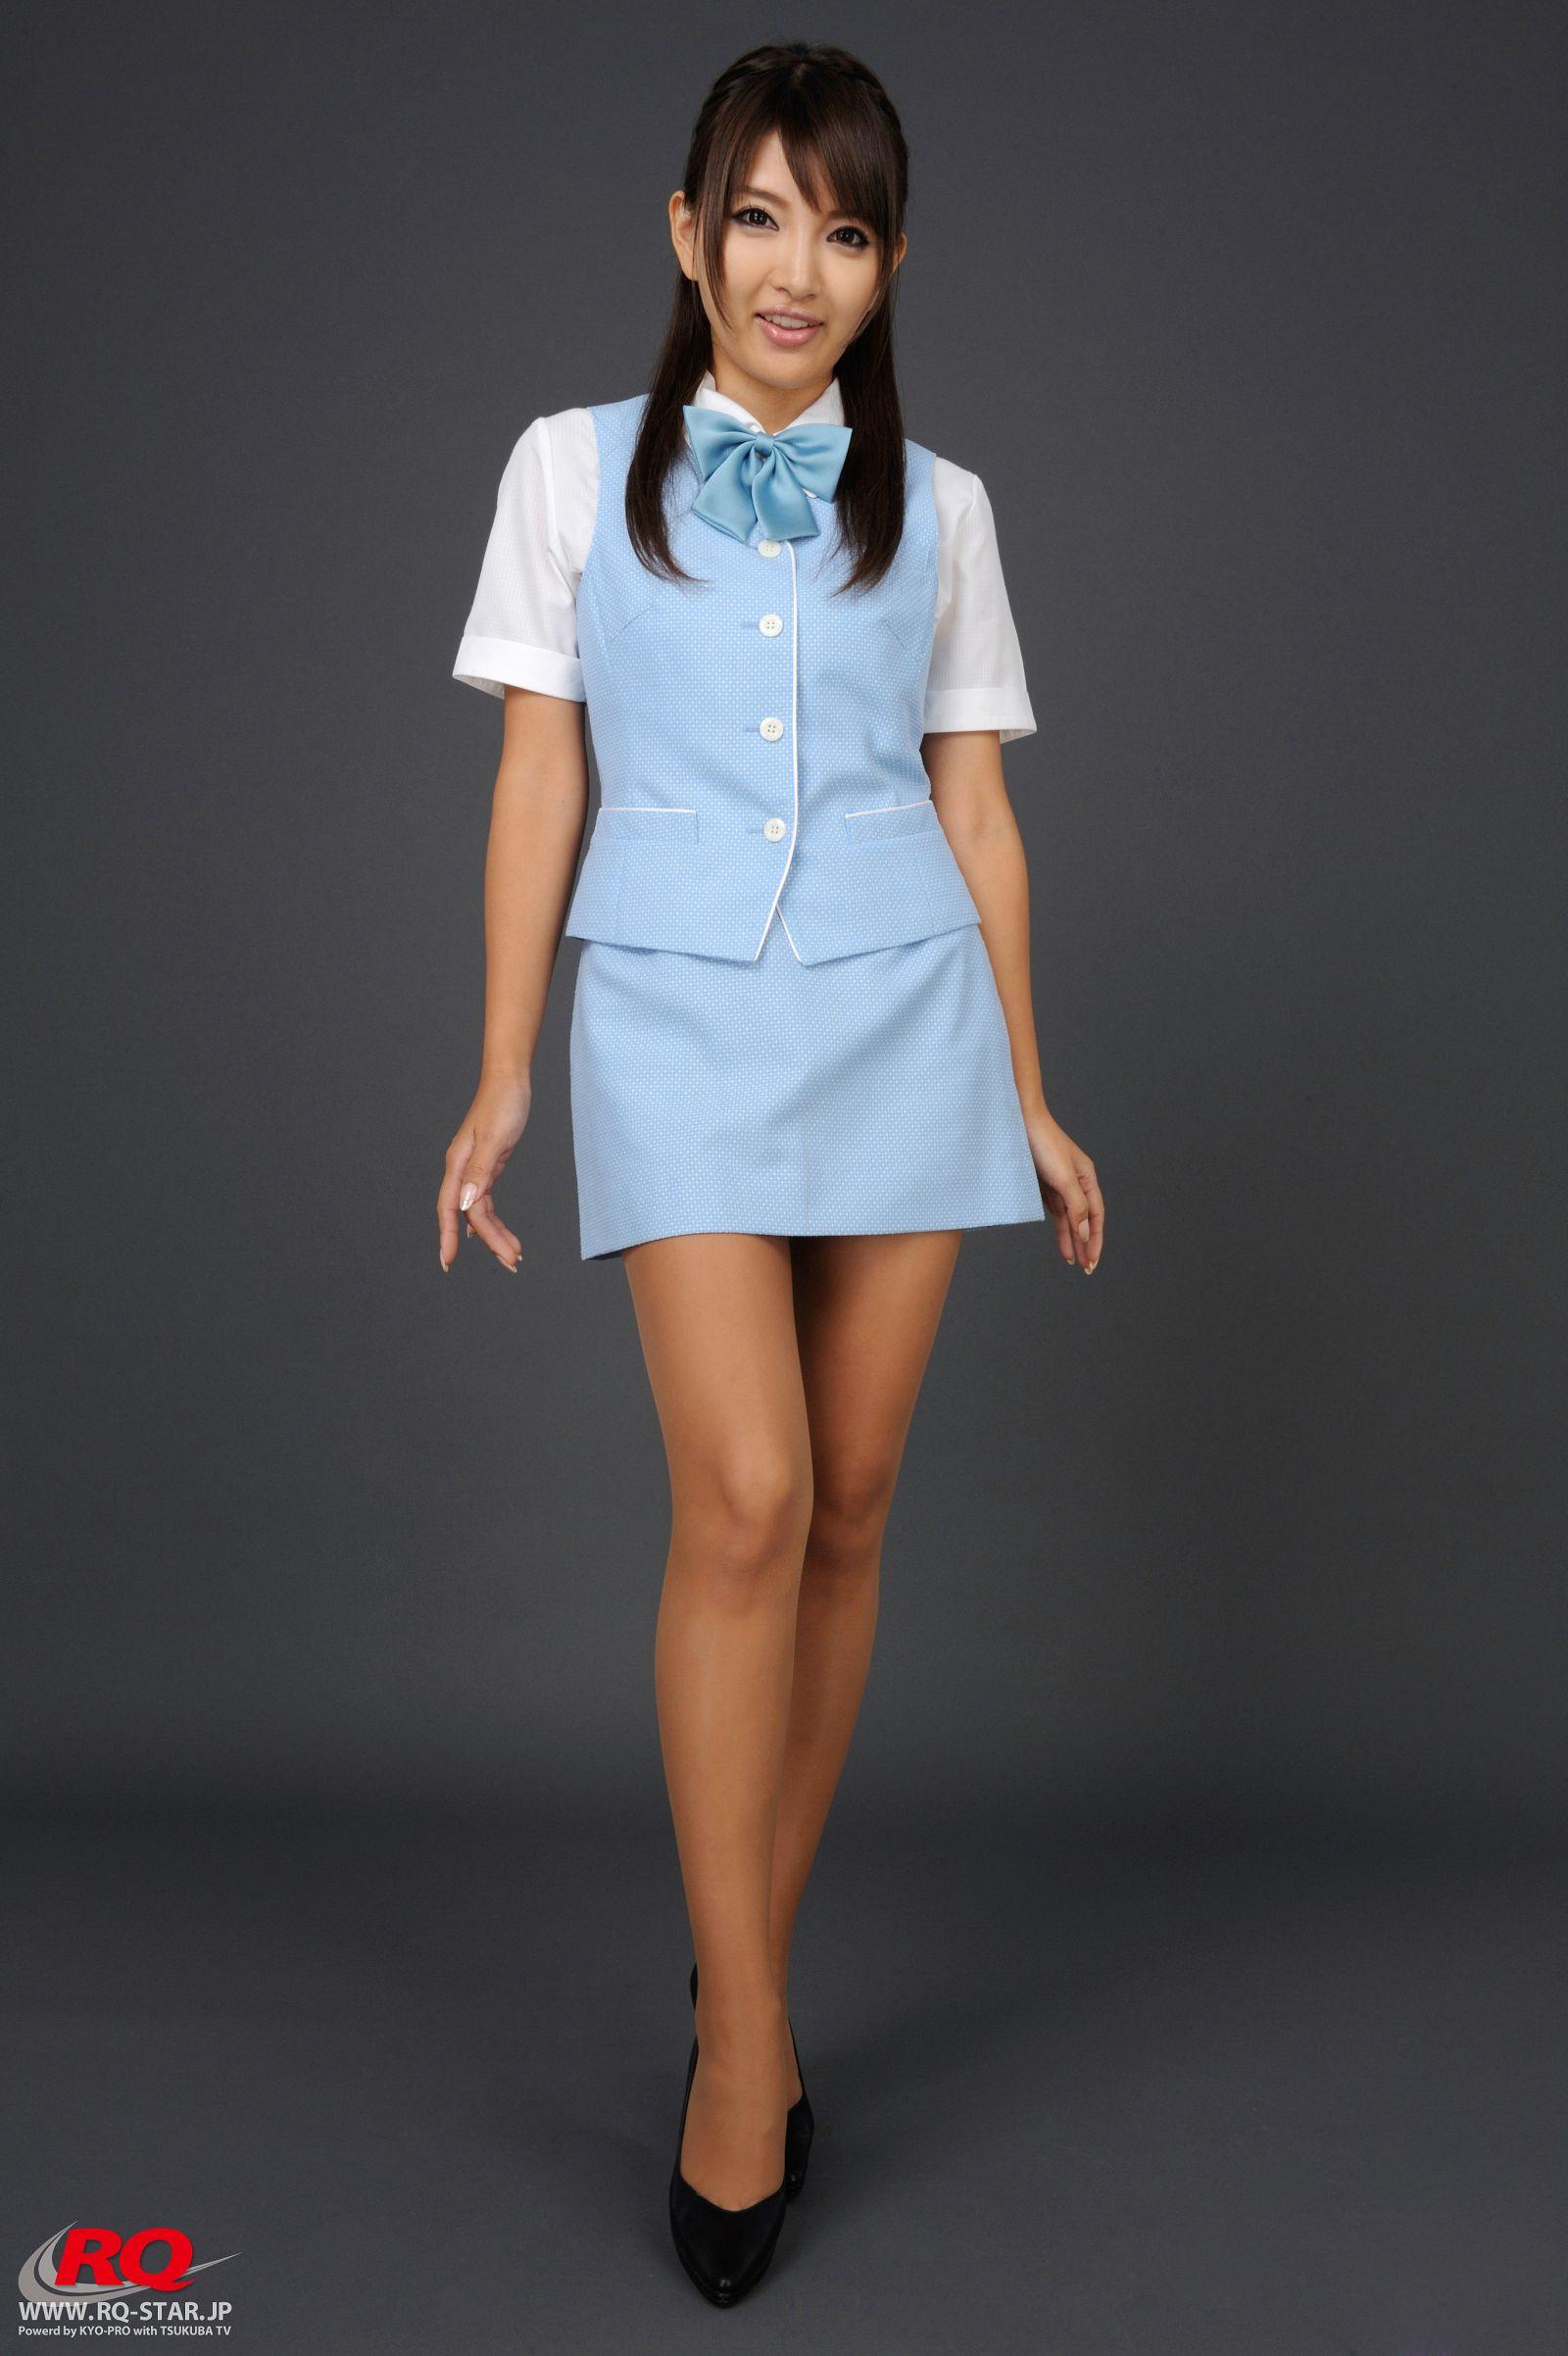 [RQ STAR美女] NO.0074 Chie Yamauchi 山內智恵 Office Lady[100P] RQ STAR 第1张